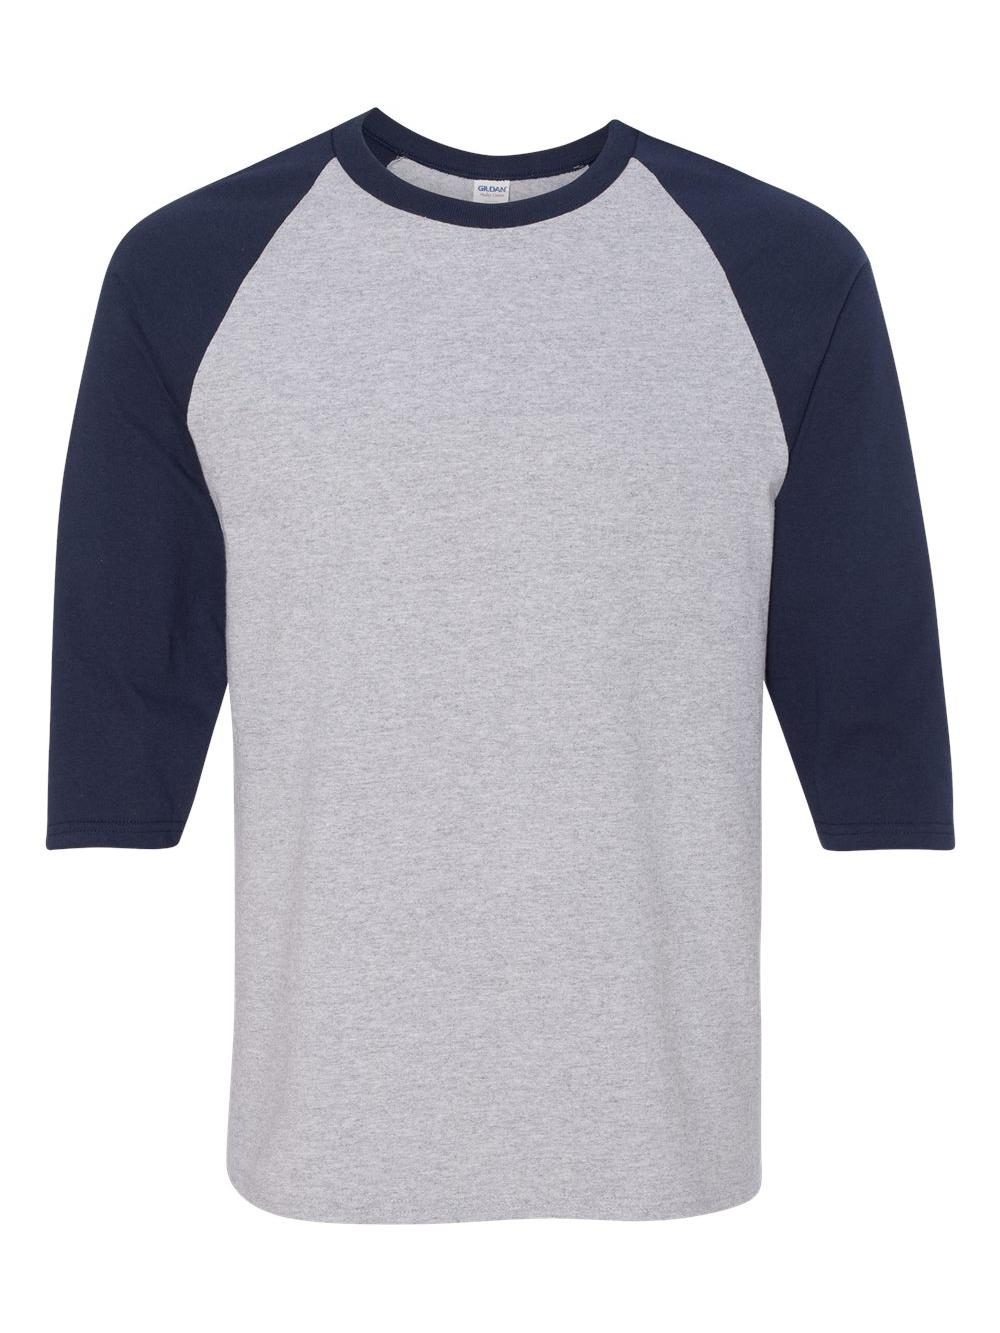 Gildan-Heavy-Cotton-Three-Quarter-Raglan-Sleeve-Baseball-T-Shirt-5700 thumbnail 9